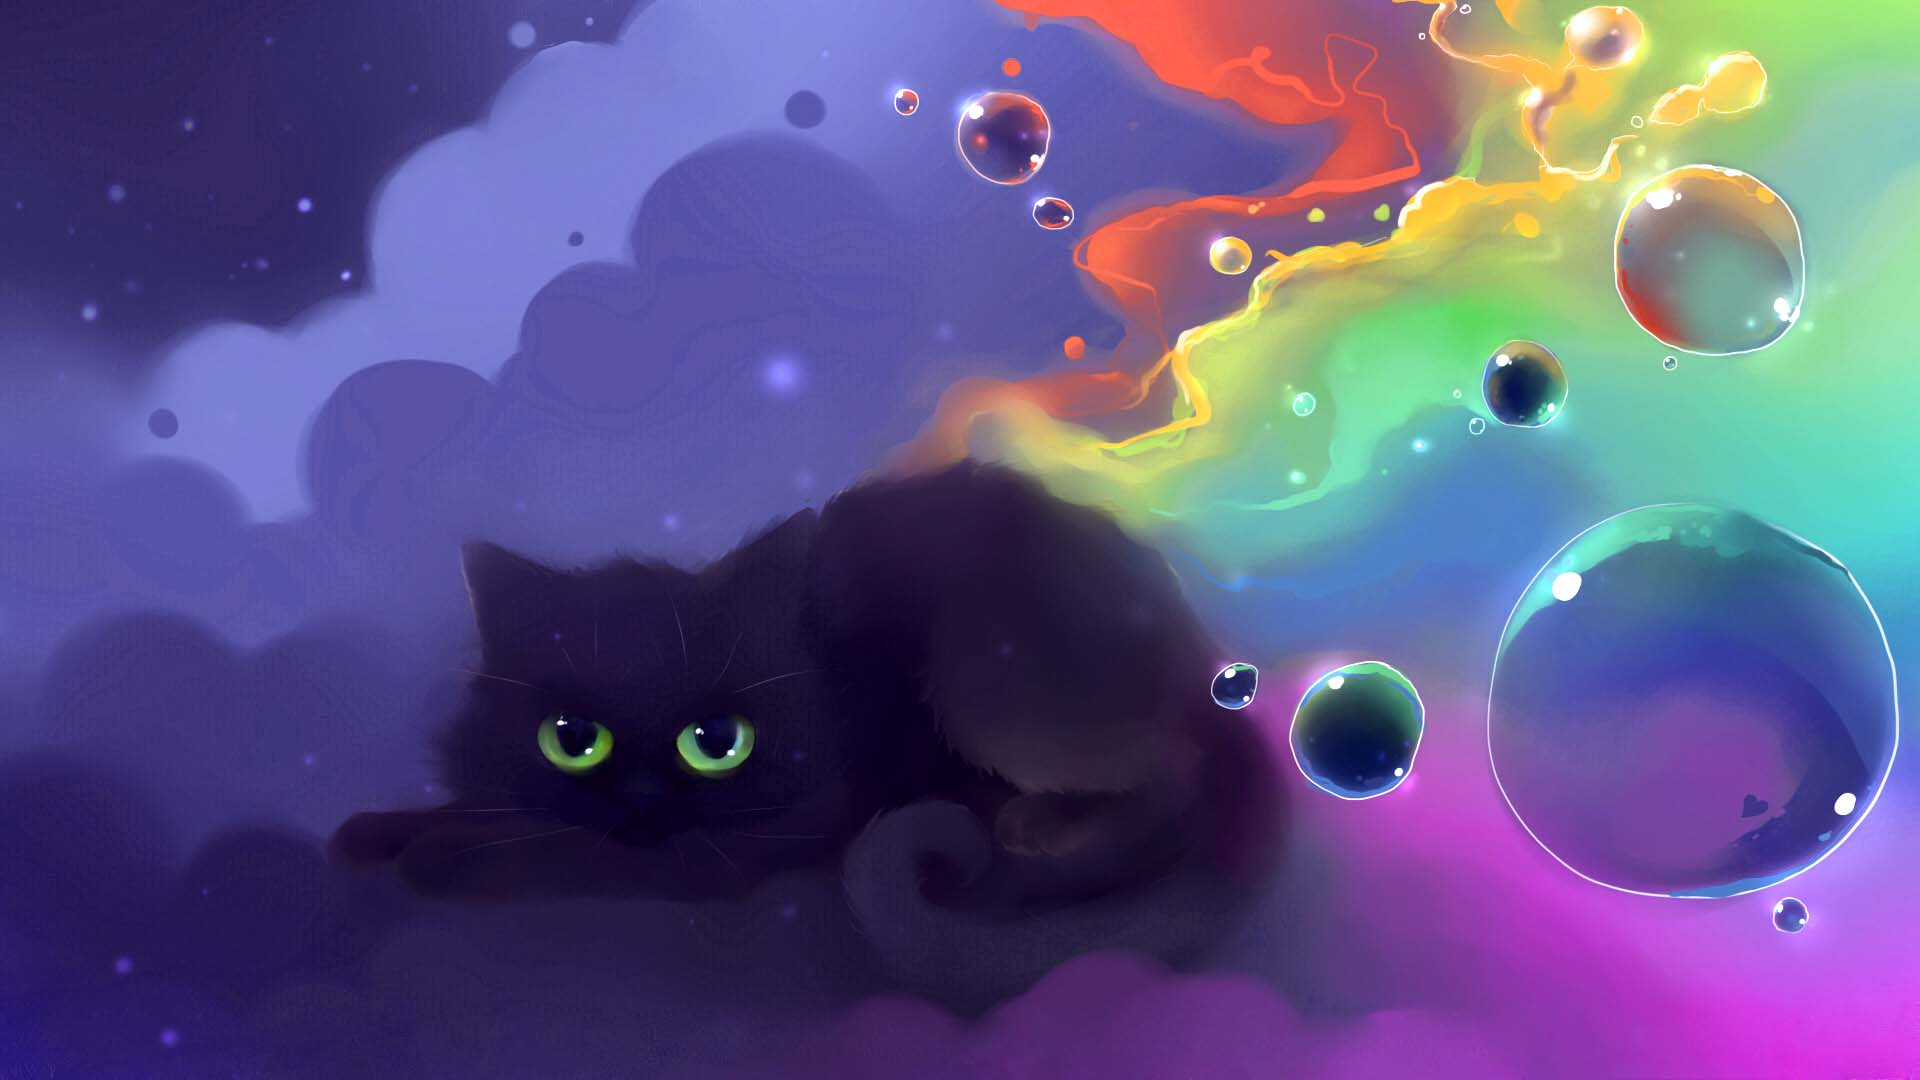 Cat cute cartoon funny 1920x1080 HD Wallpaper and FREE Stock Photo 1920x1080